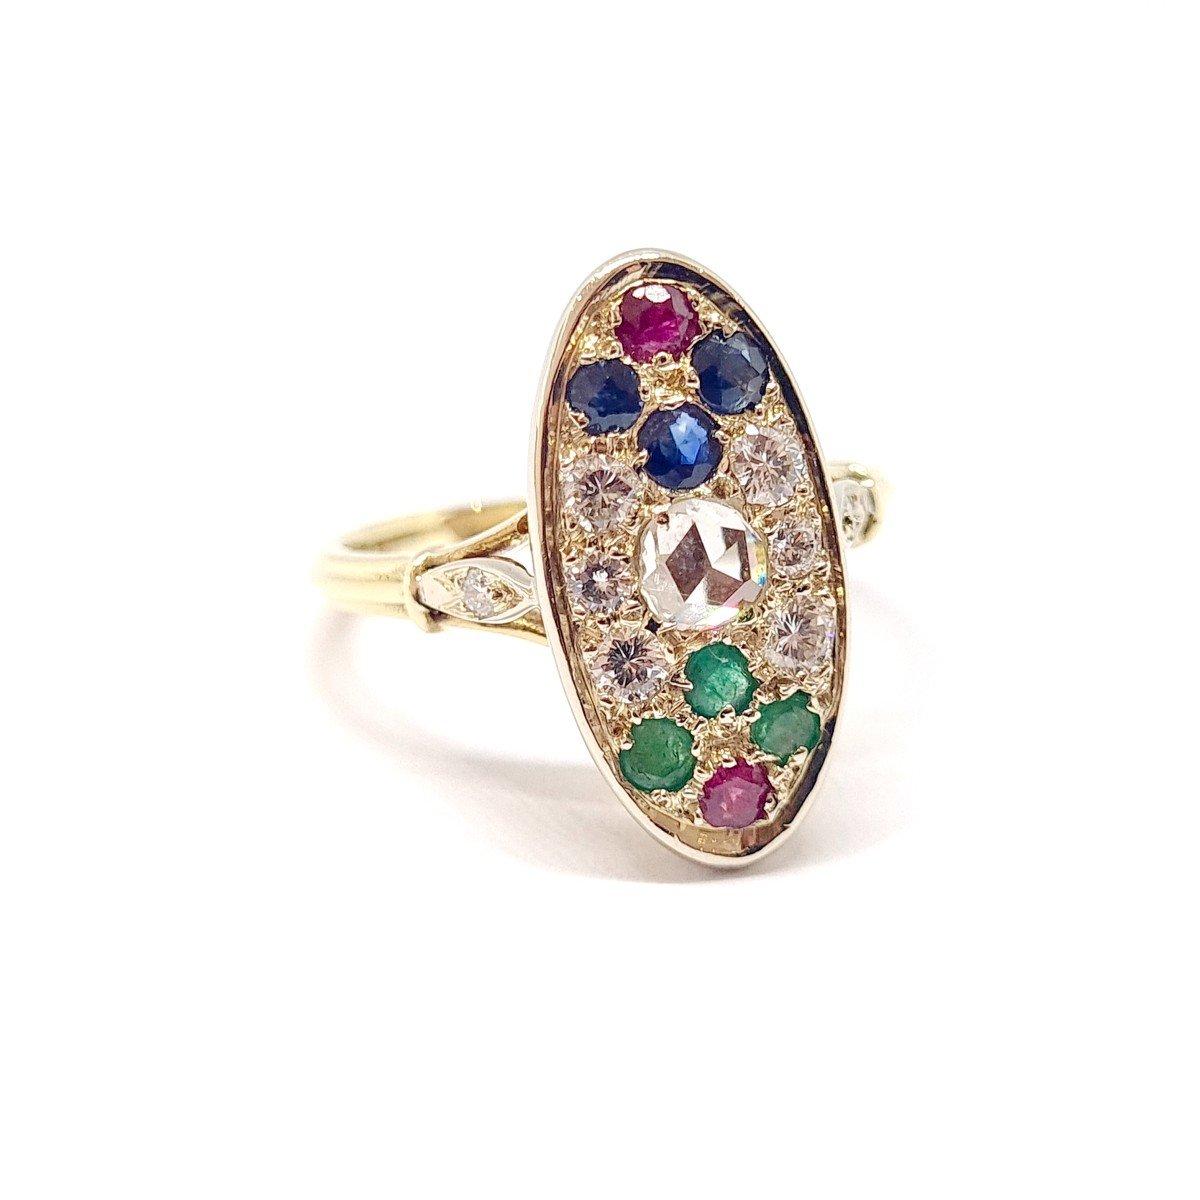 Bague Ancienne Or Jaune 18 Carats Diamants Saphirs Rubis émeraudes-photo-4